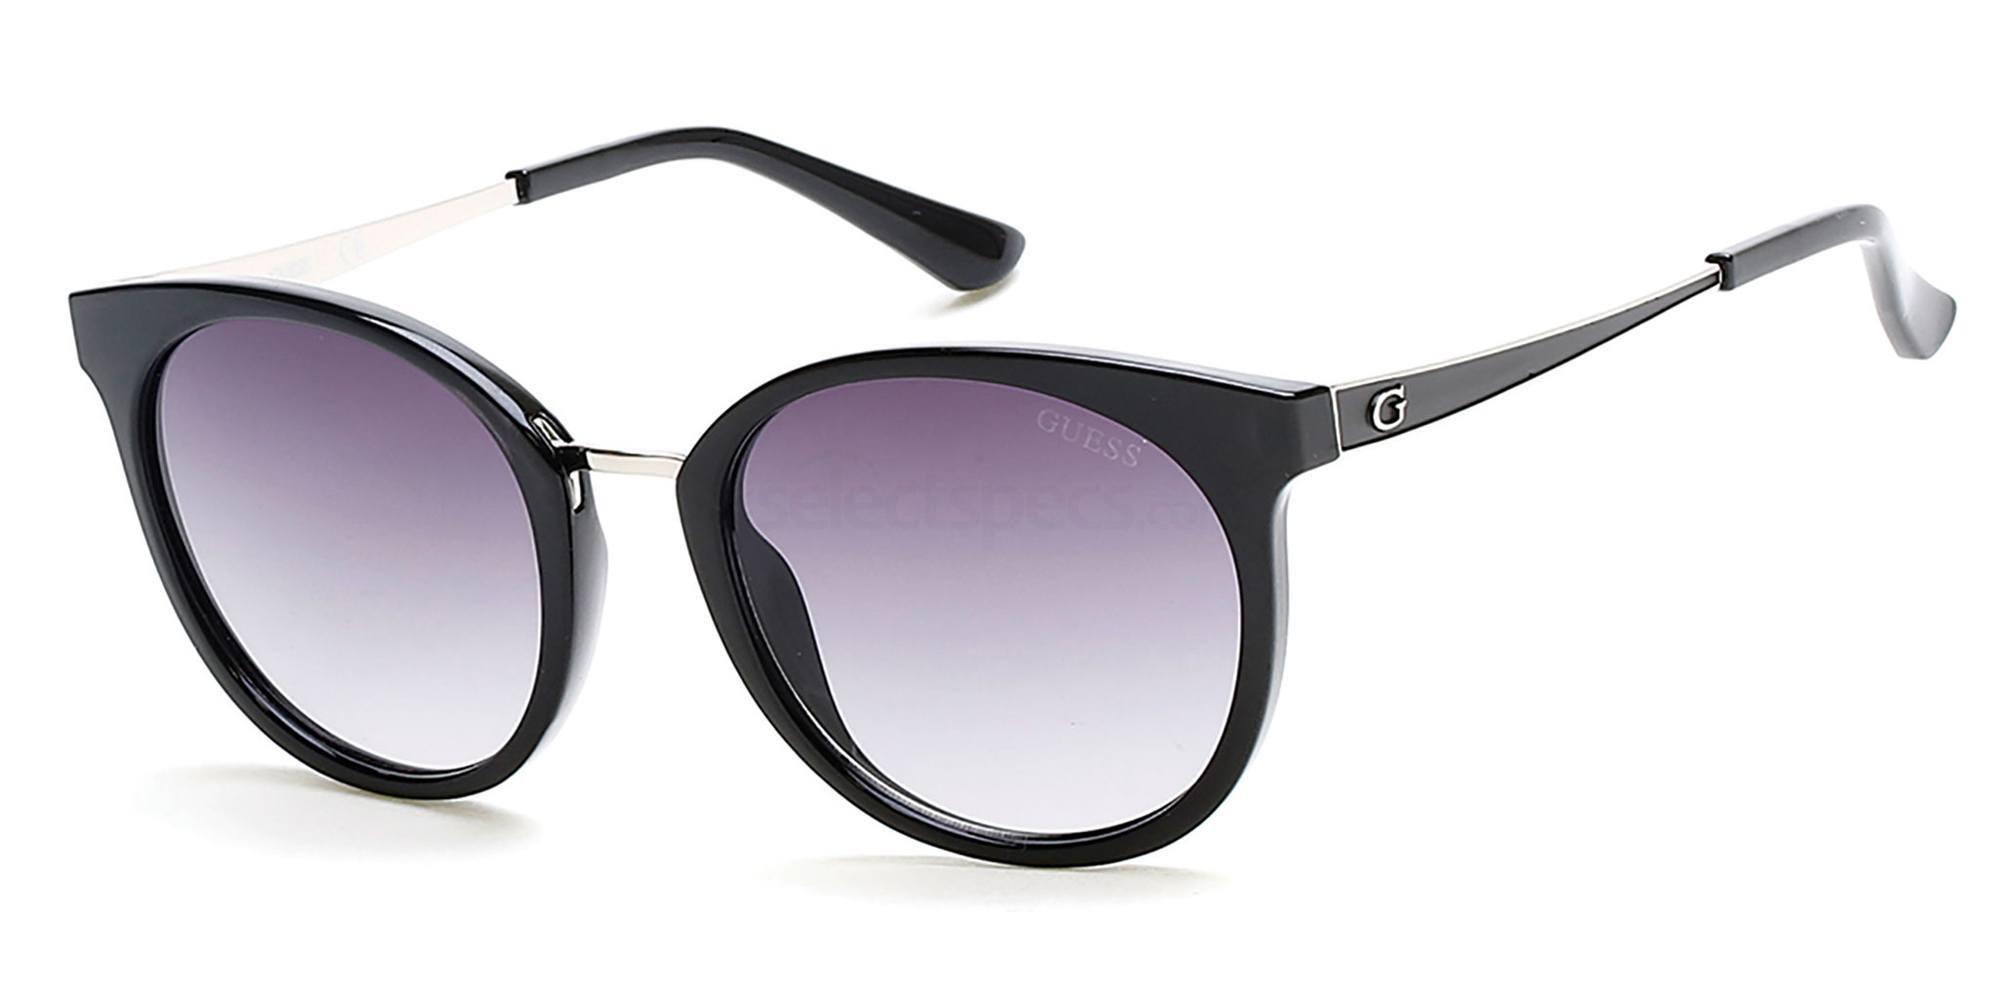 01B GU7459 Sunglasses, Guess